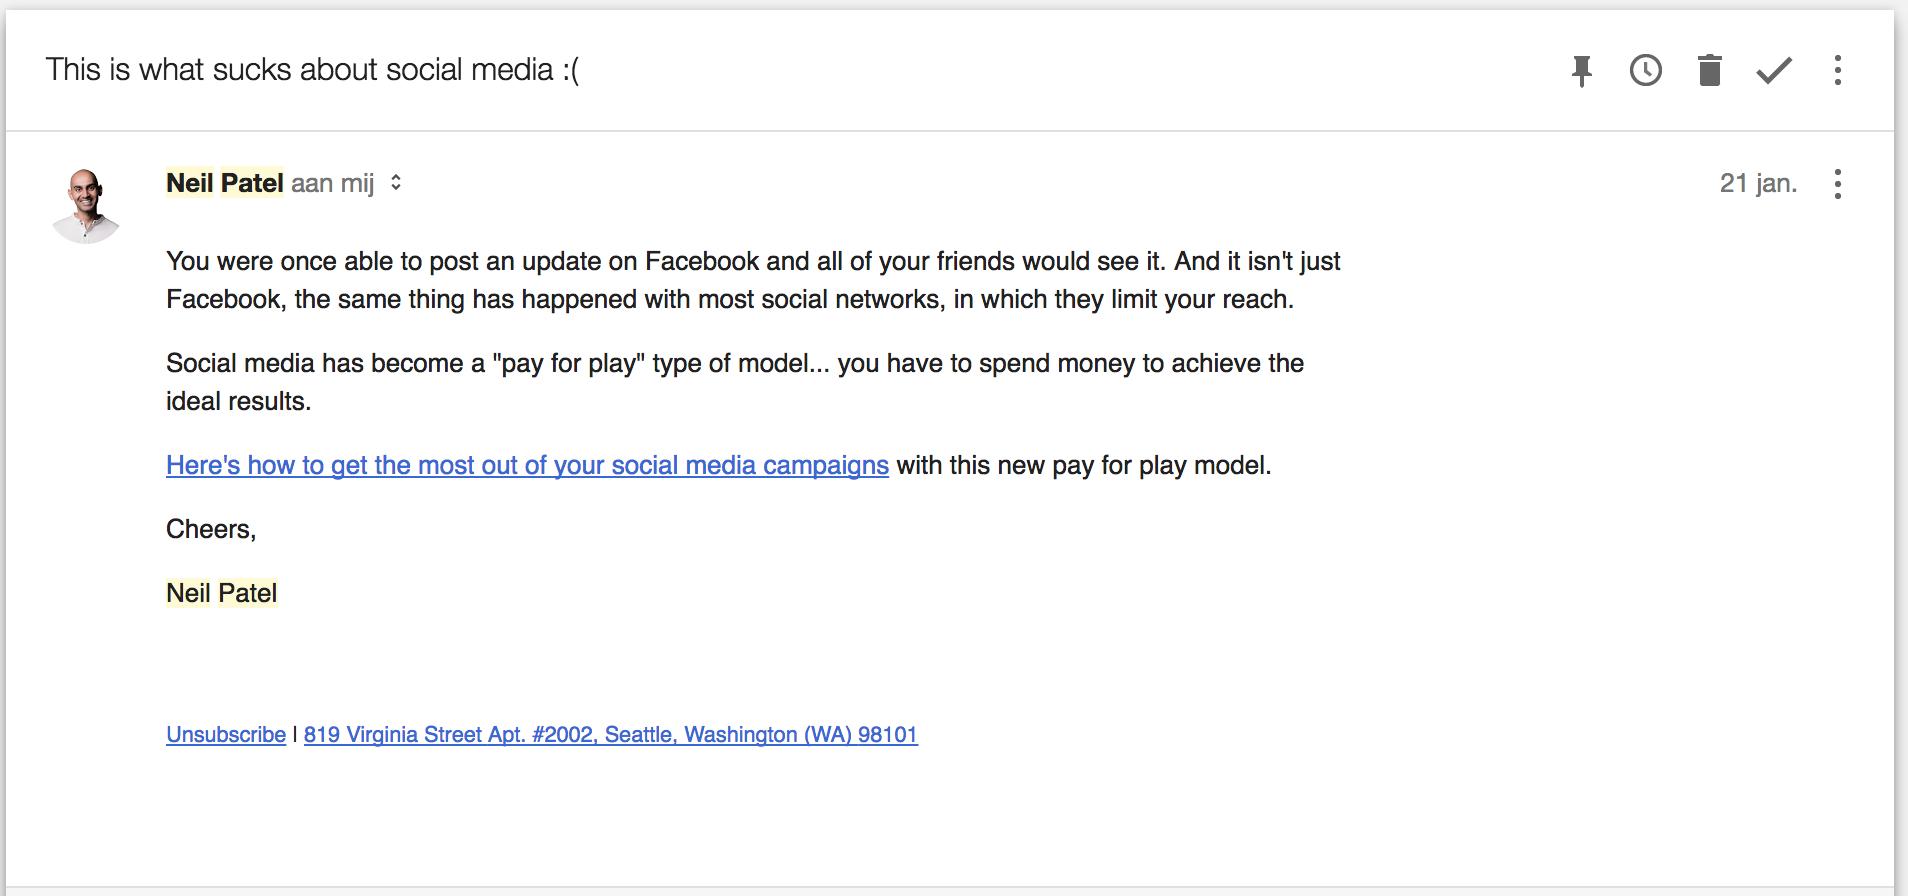 Neil Patel e-mail